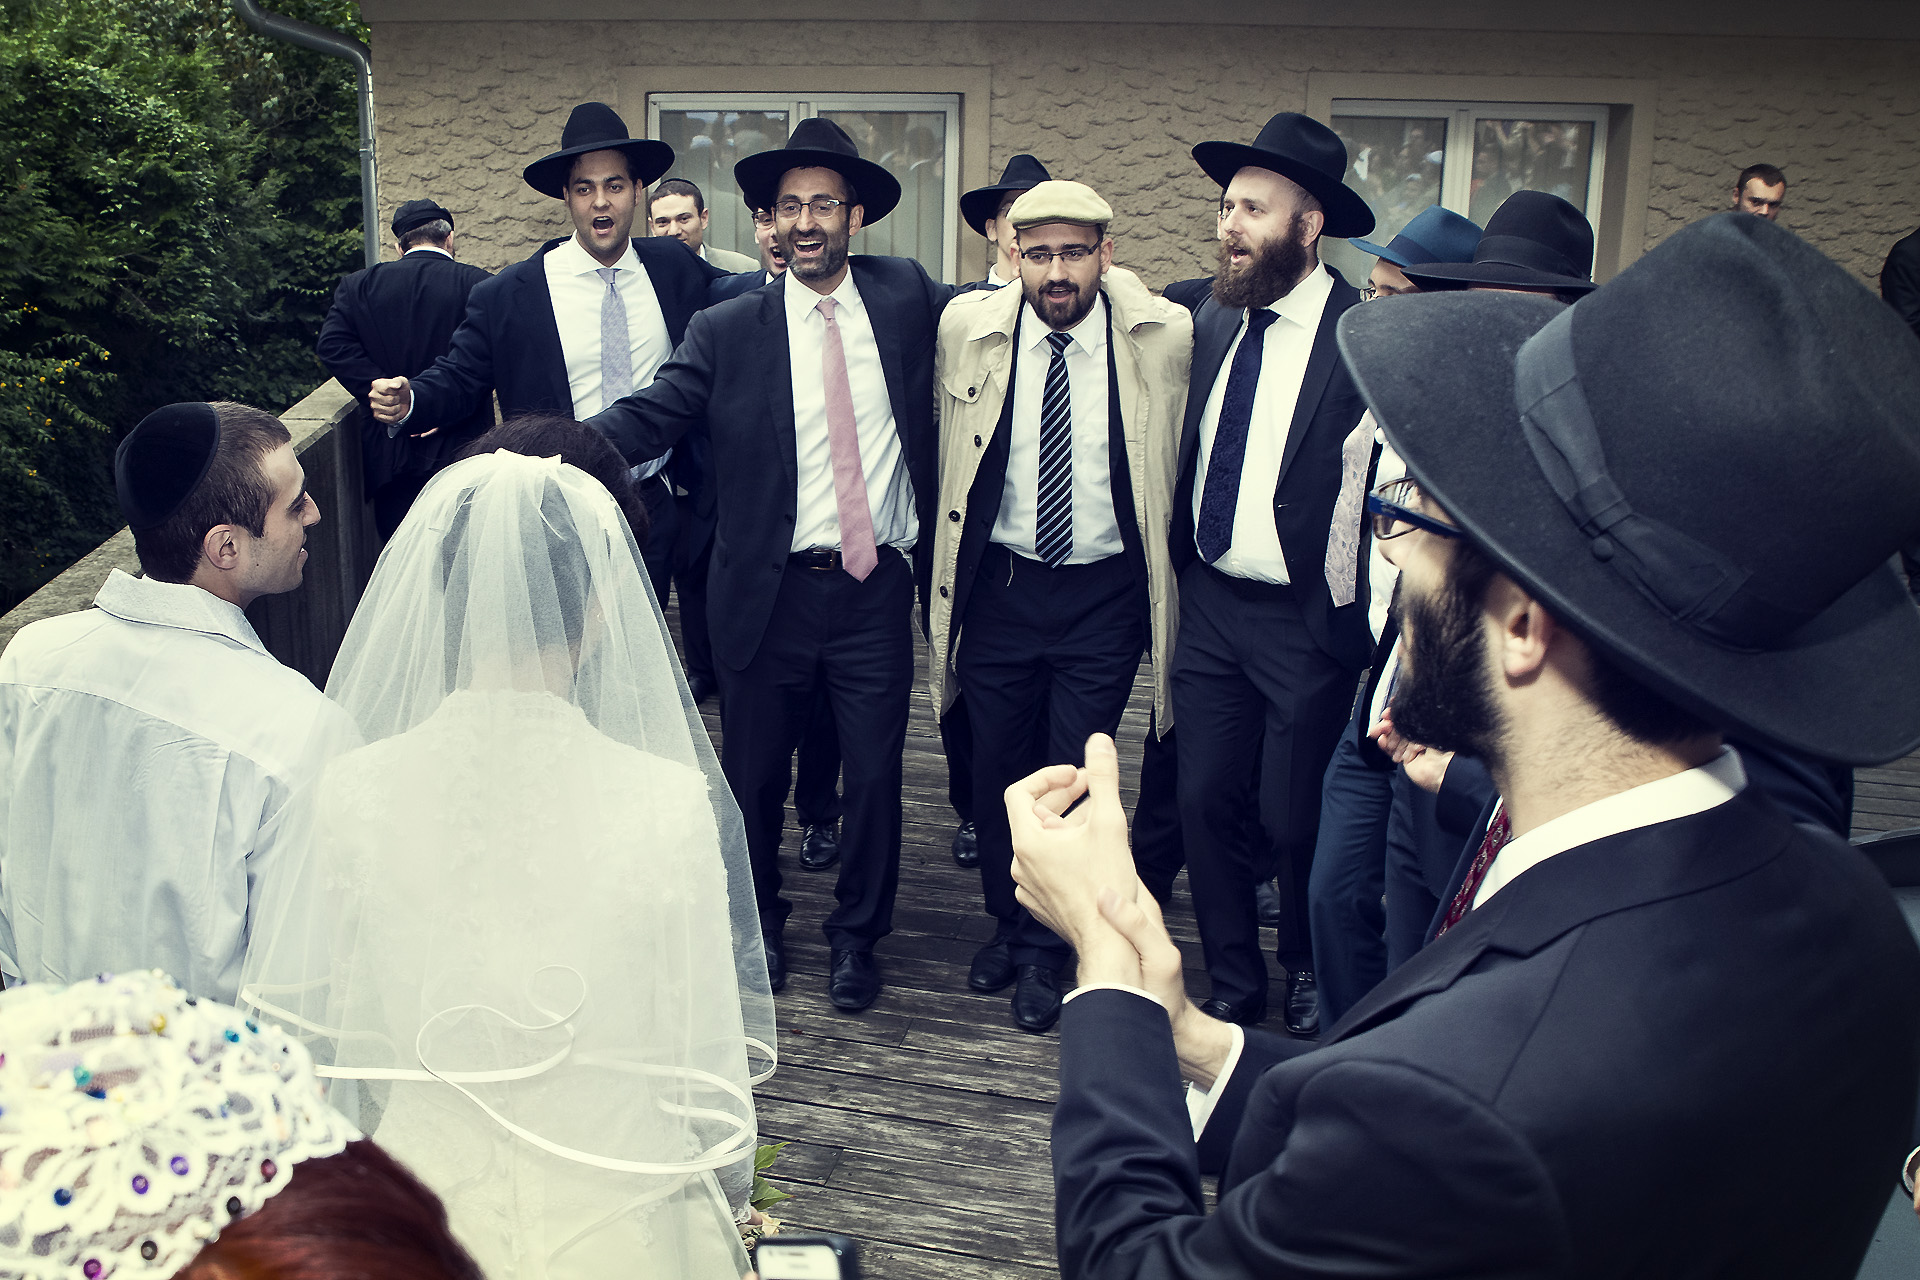 Hochzeitsfeier Leipzig Fotograf Hochzeitsfotograf